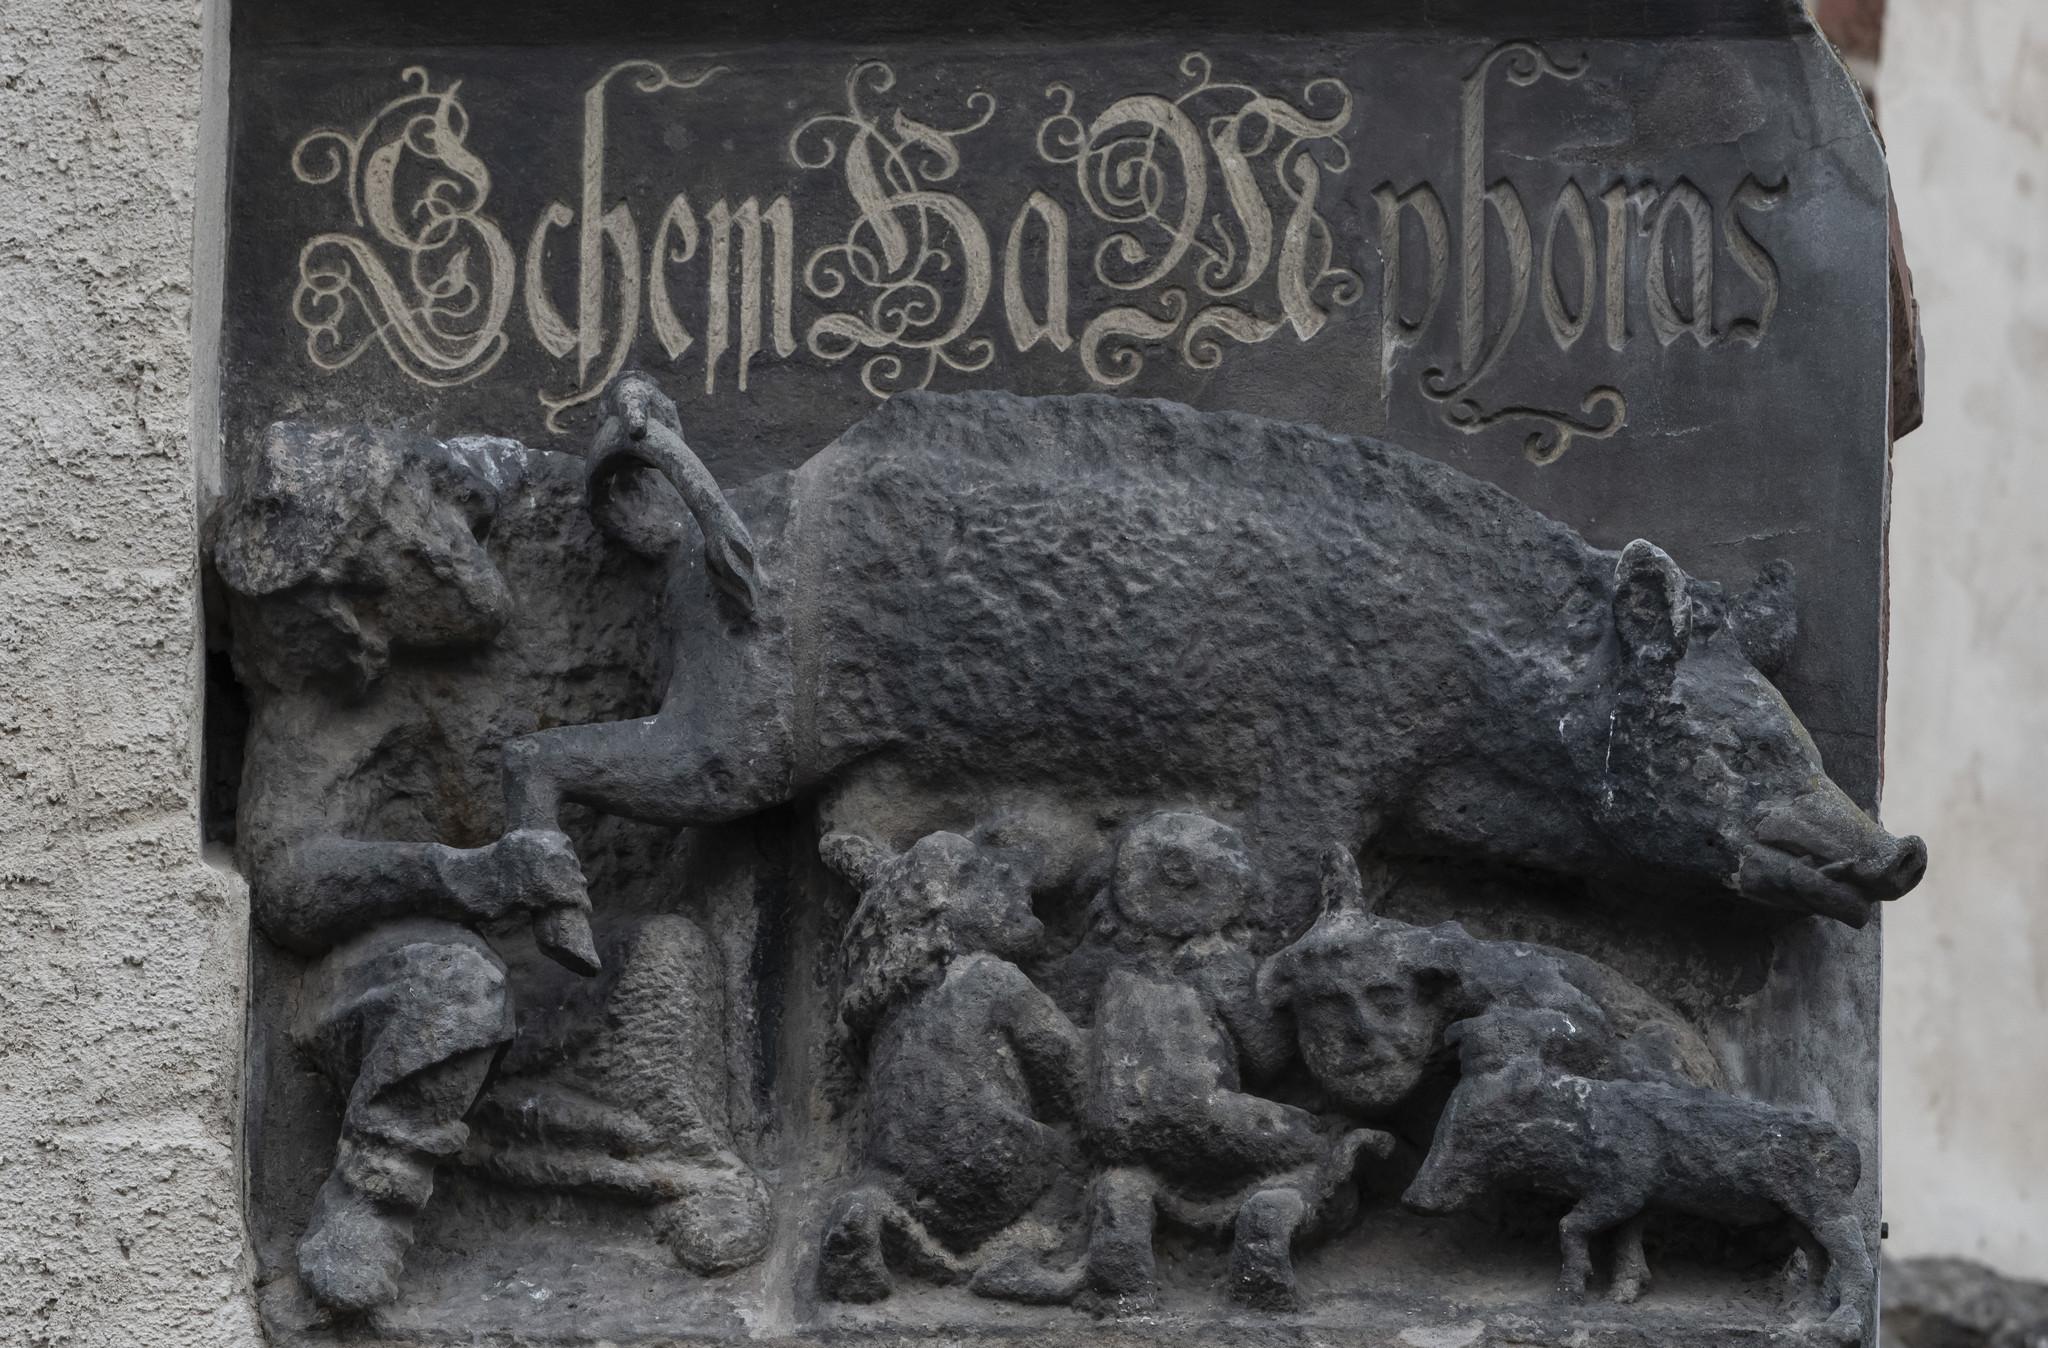 German appeals court rules church can keep anti-Semitic 'Jew pig' statue